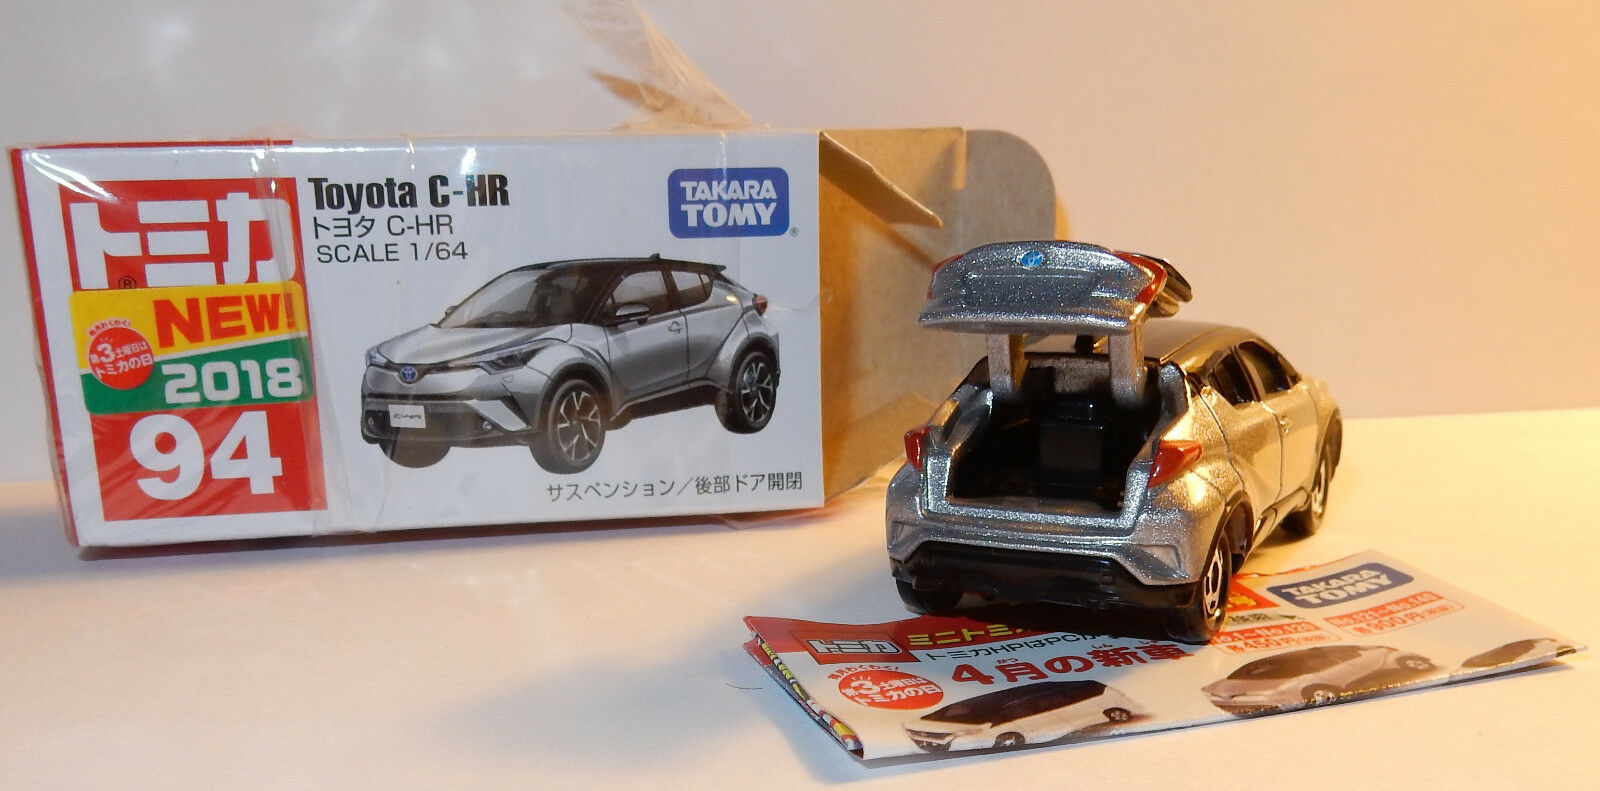 TOY CAR TAKARA TOMY TOMICA 94 Toyota C-HR Display Display Display MINI Car 3 Zoll 1 64 IN BOX  | Kaufen  085013